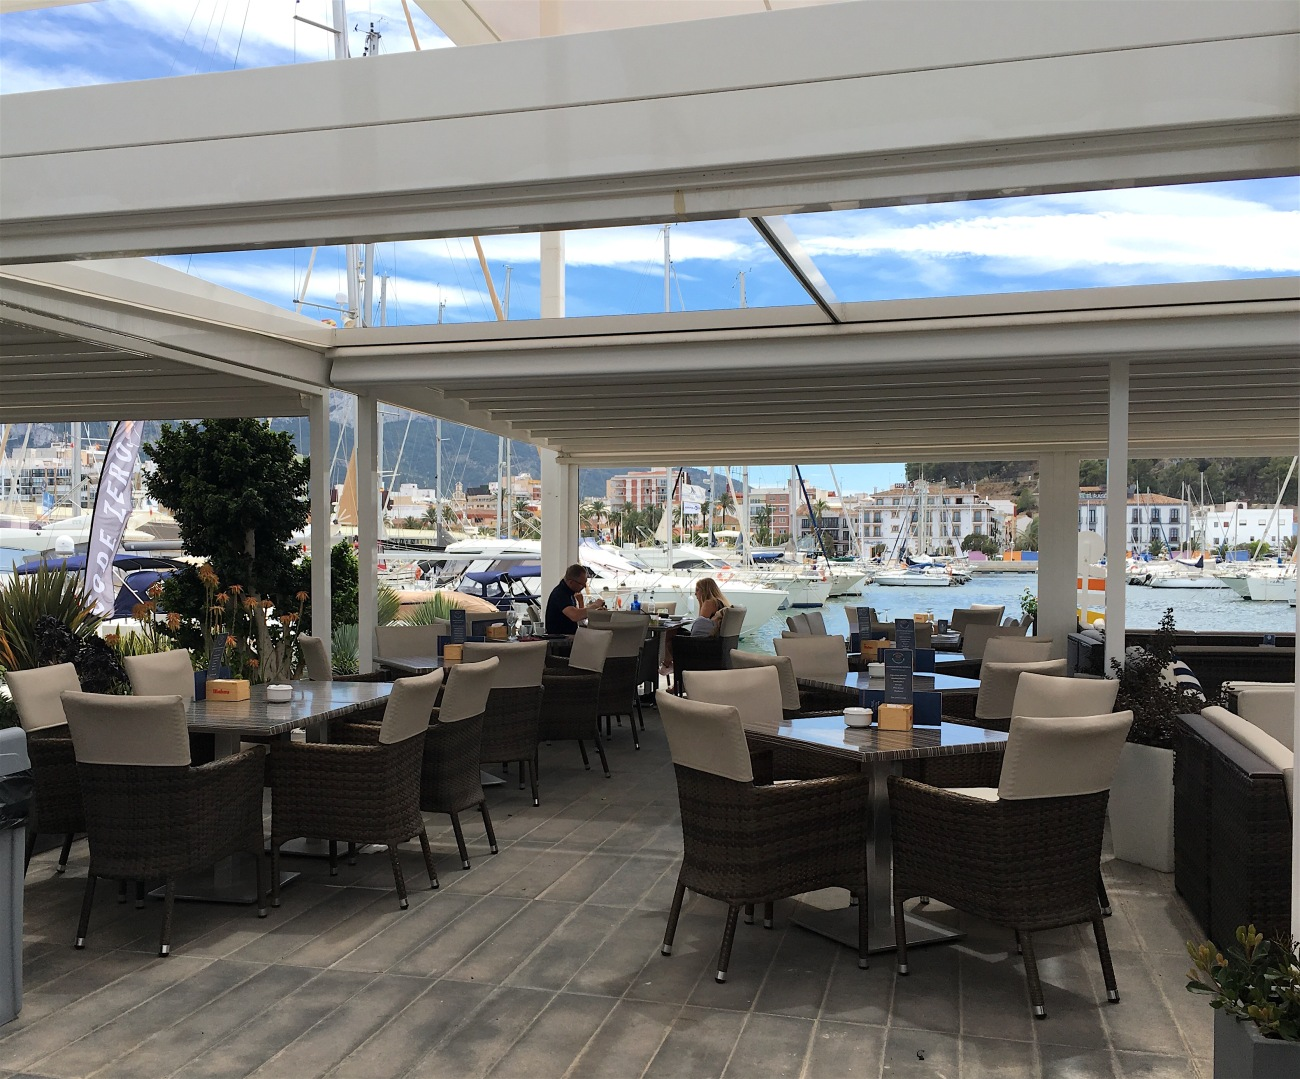 Pekado Mortal Mediterranean Fish restaurant Denia Spain